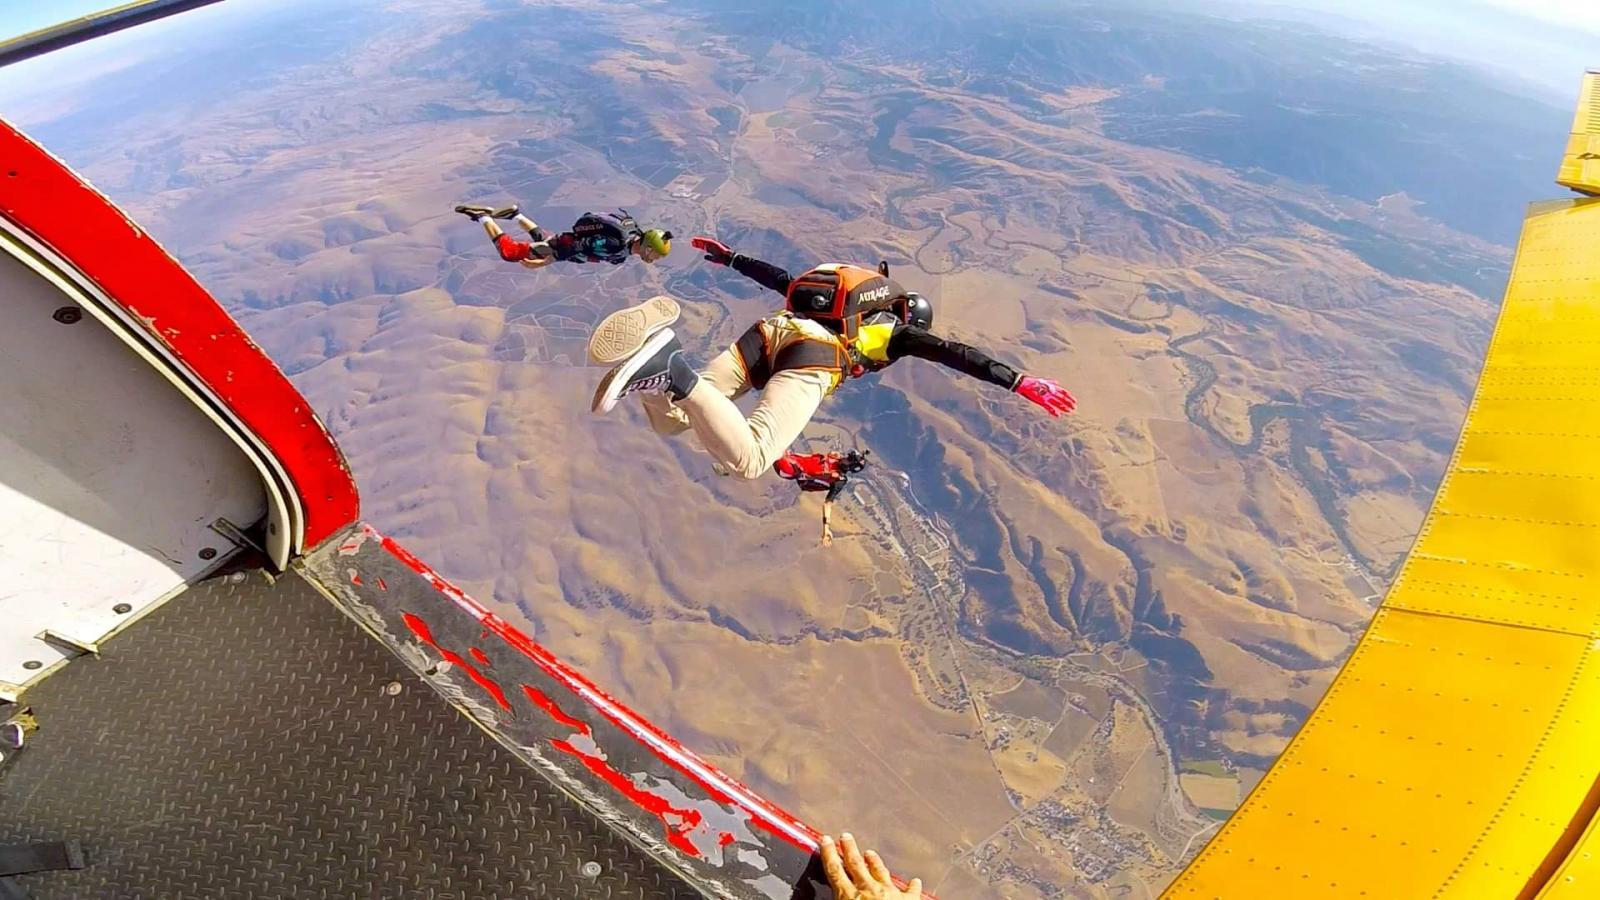 Micah, Sebastian, and Julien exit at Skydive Hollister